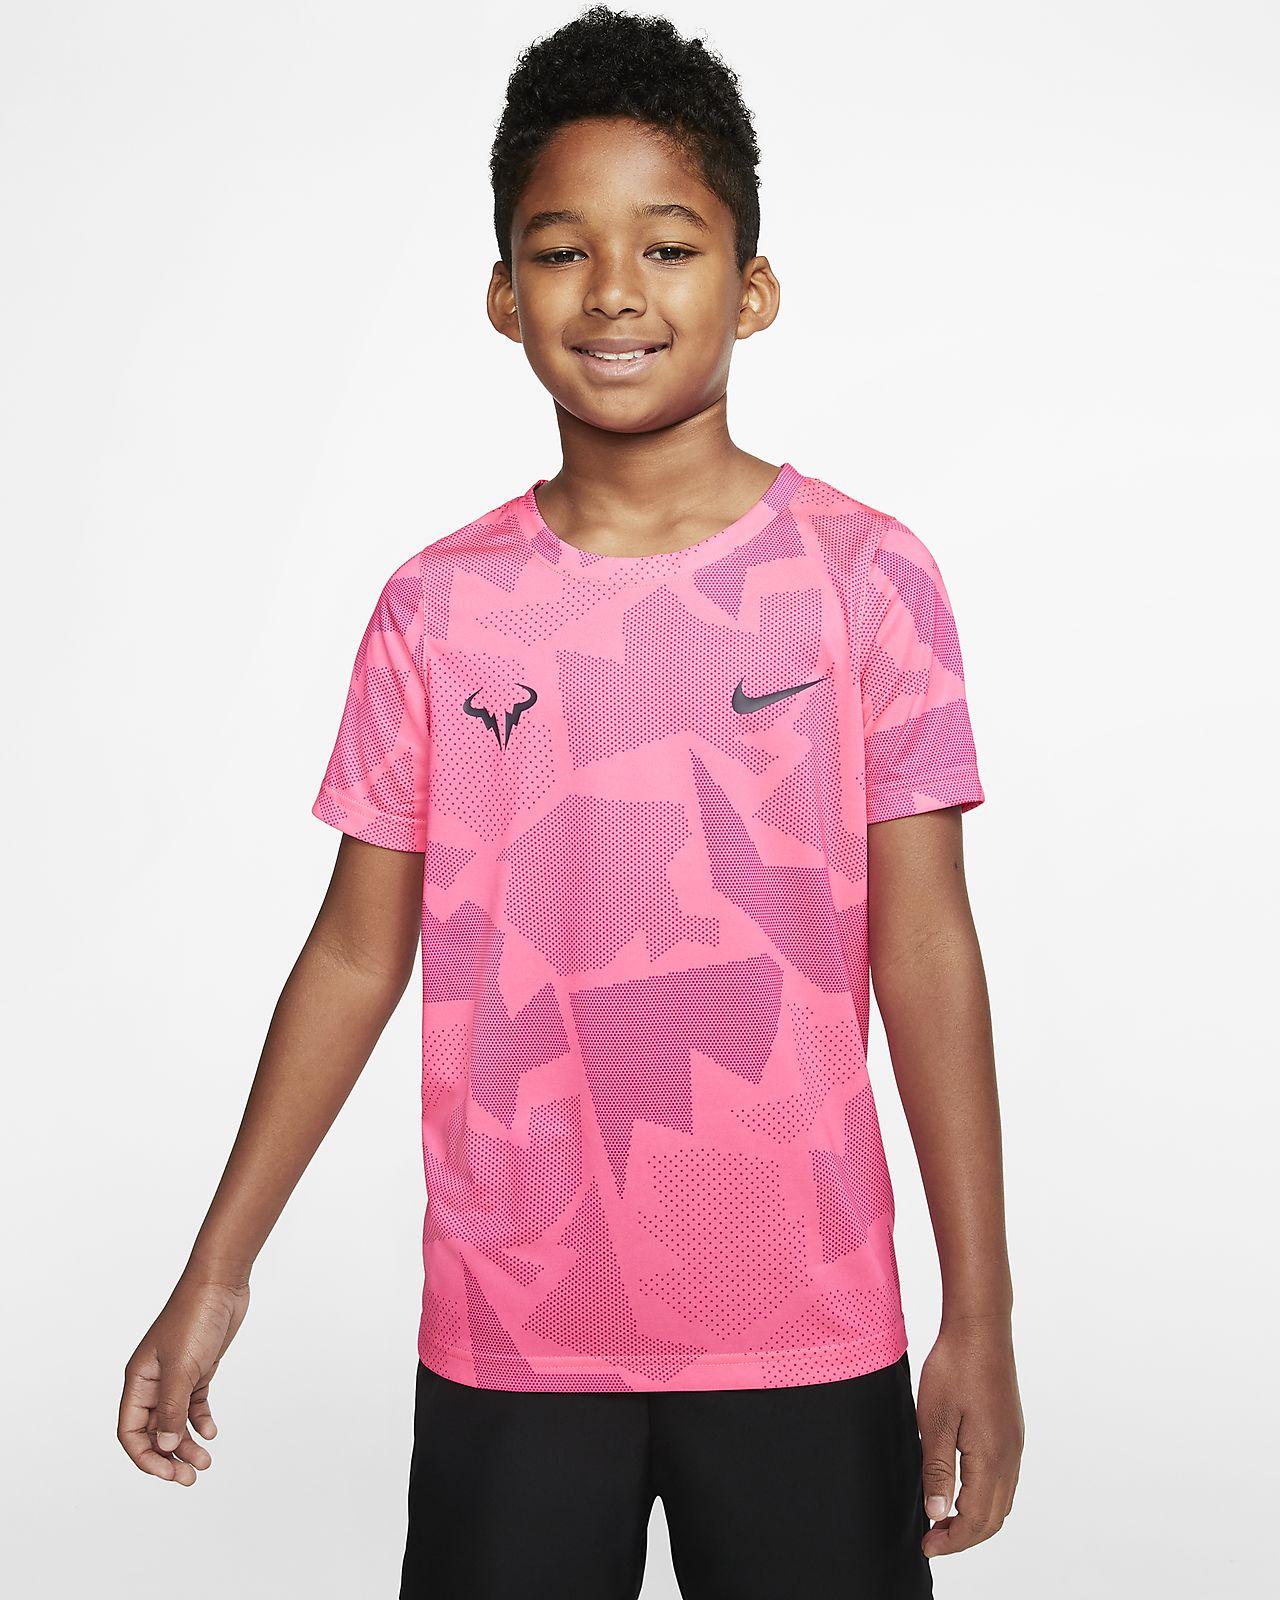 Tee shirt de tennis NikeCourt Dri FIT Rafa pour Garçon